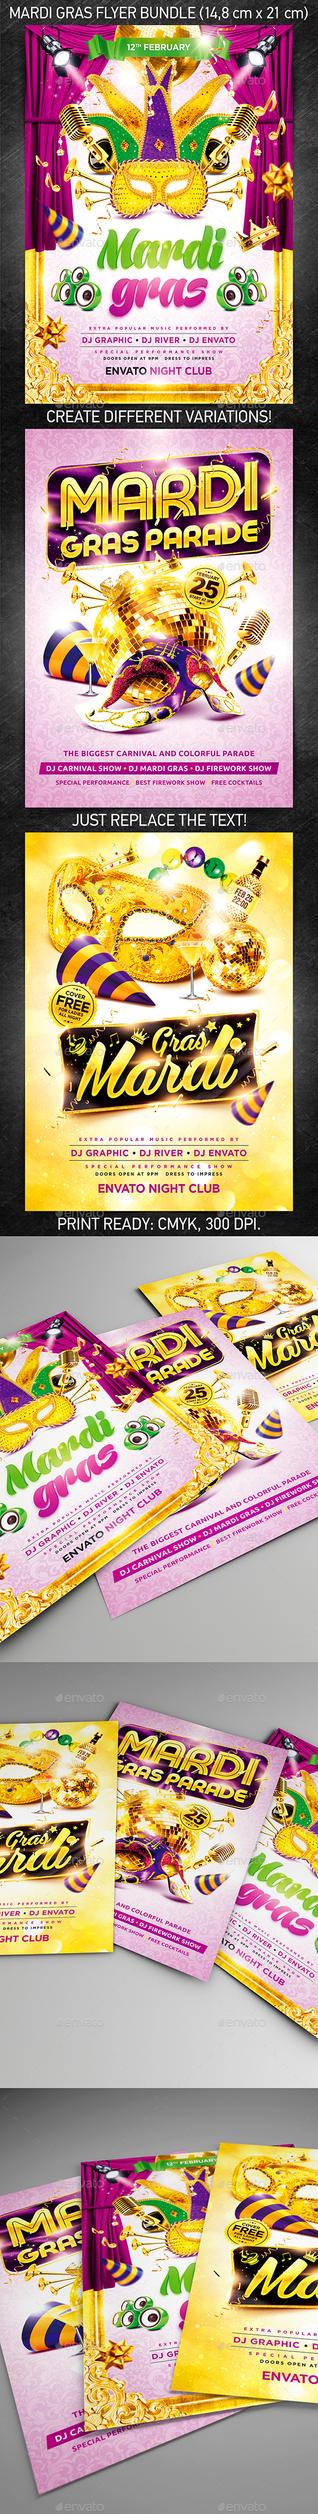 Mardi Gras Party Flyer Bundle, PSD Template by 4ustudio